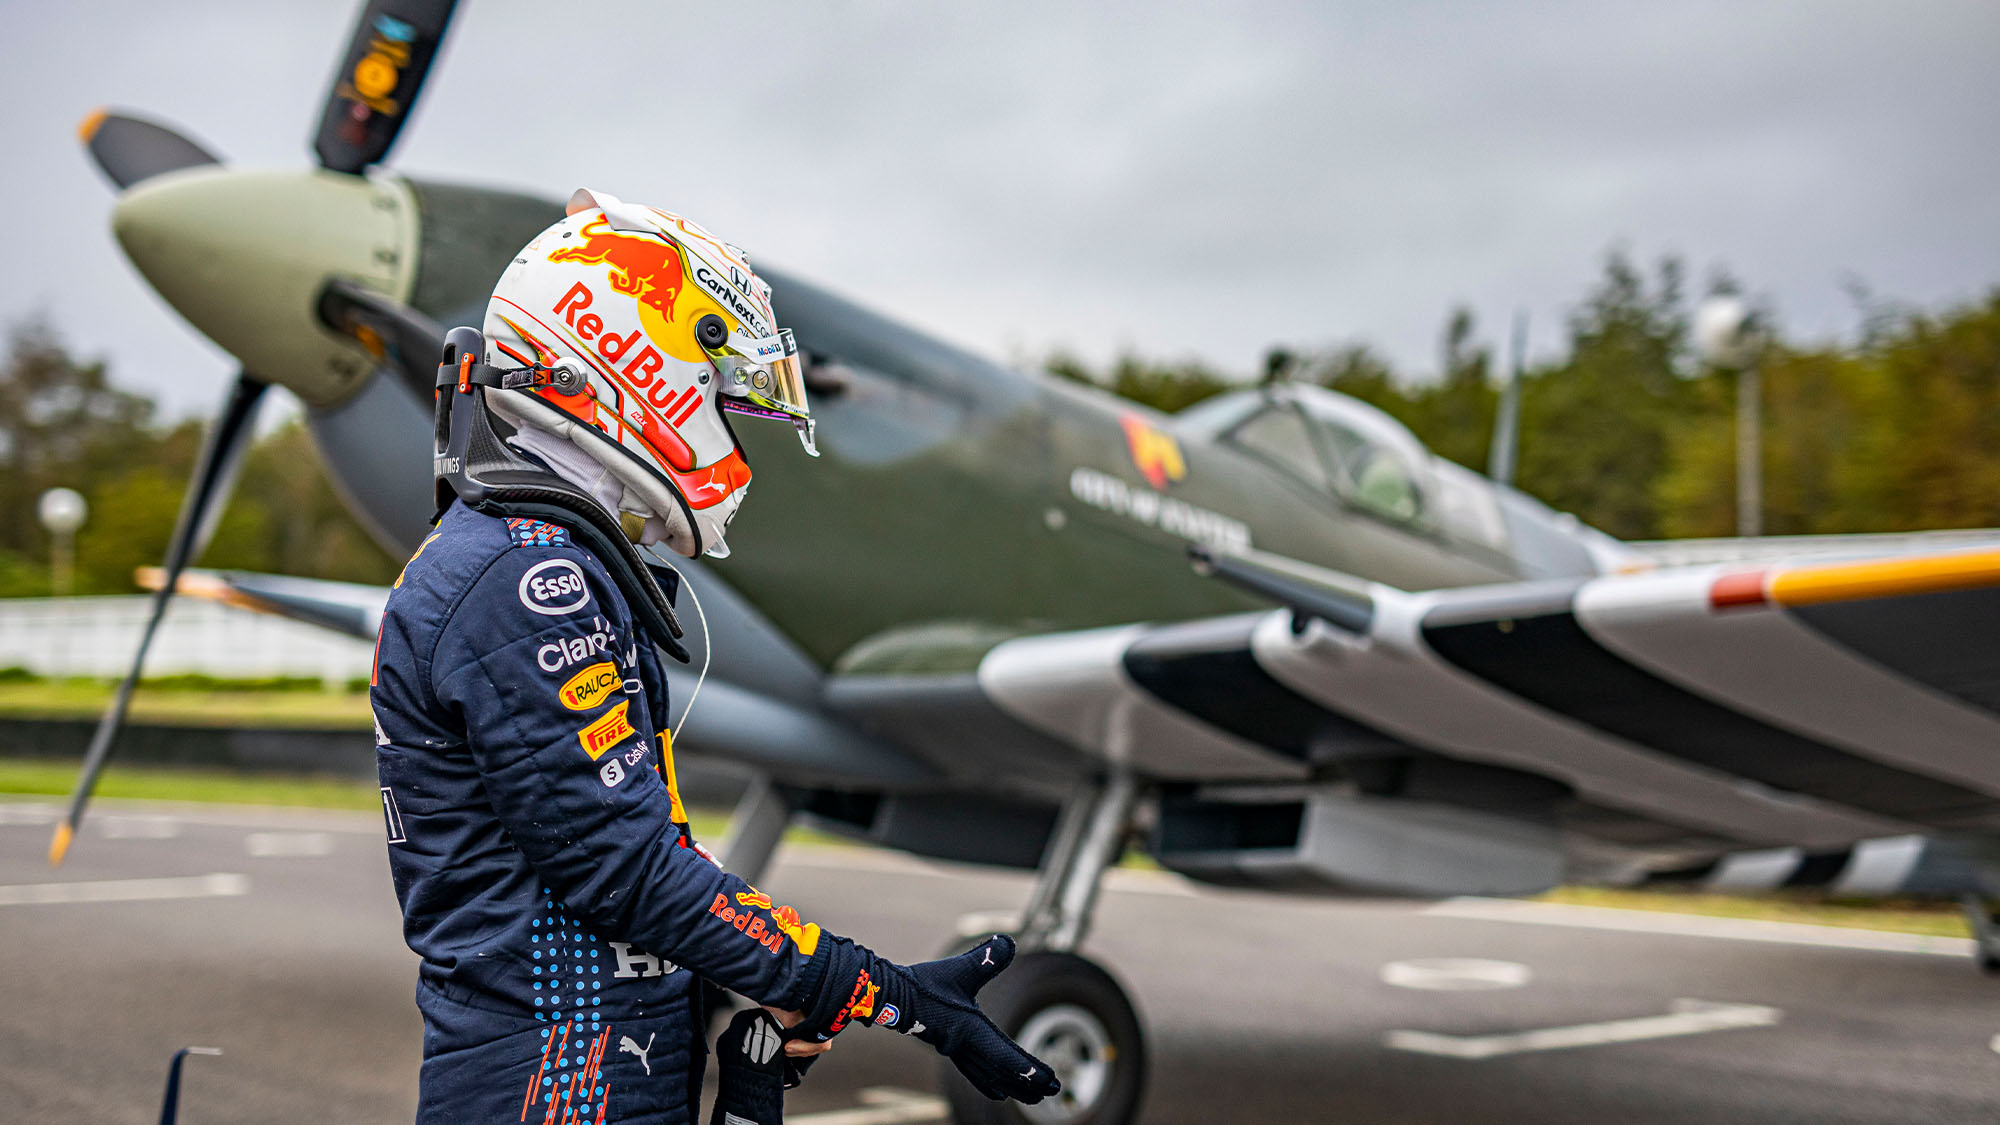 Red Bull spitfire